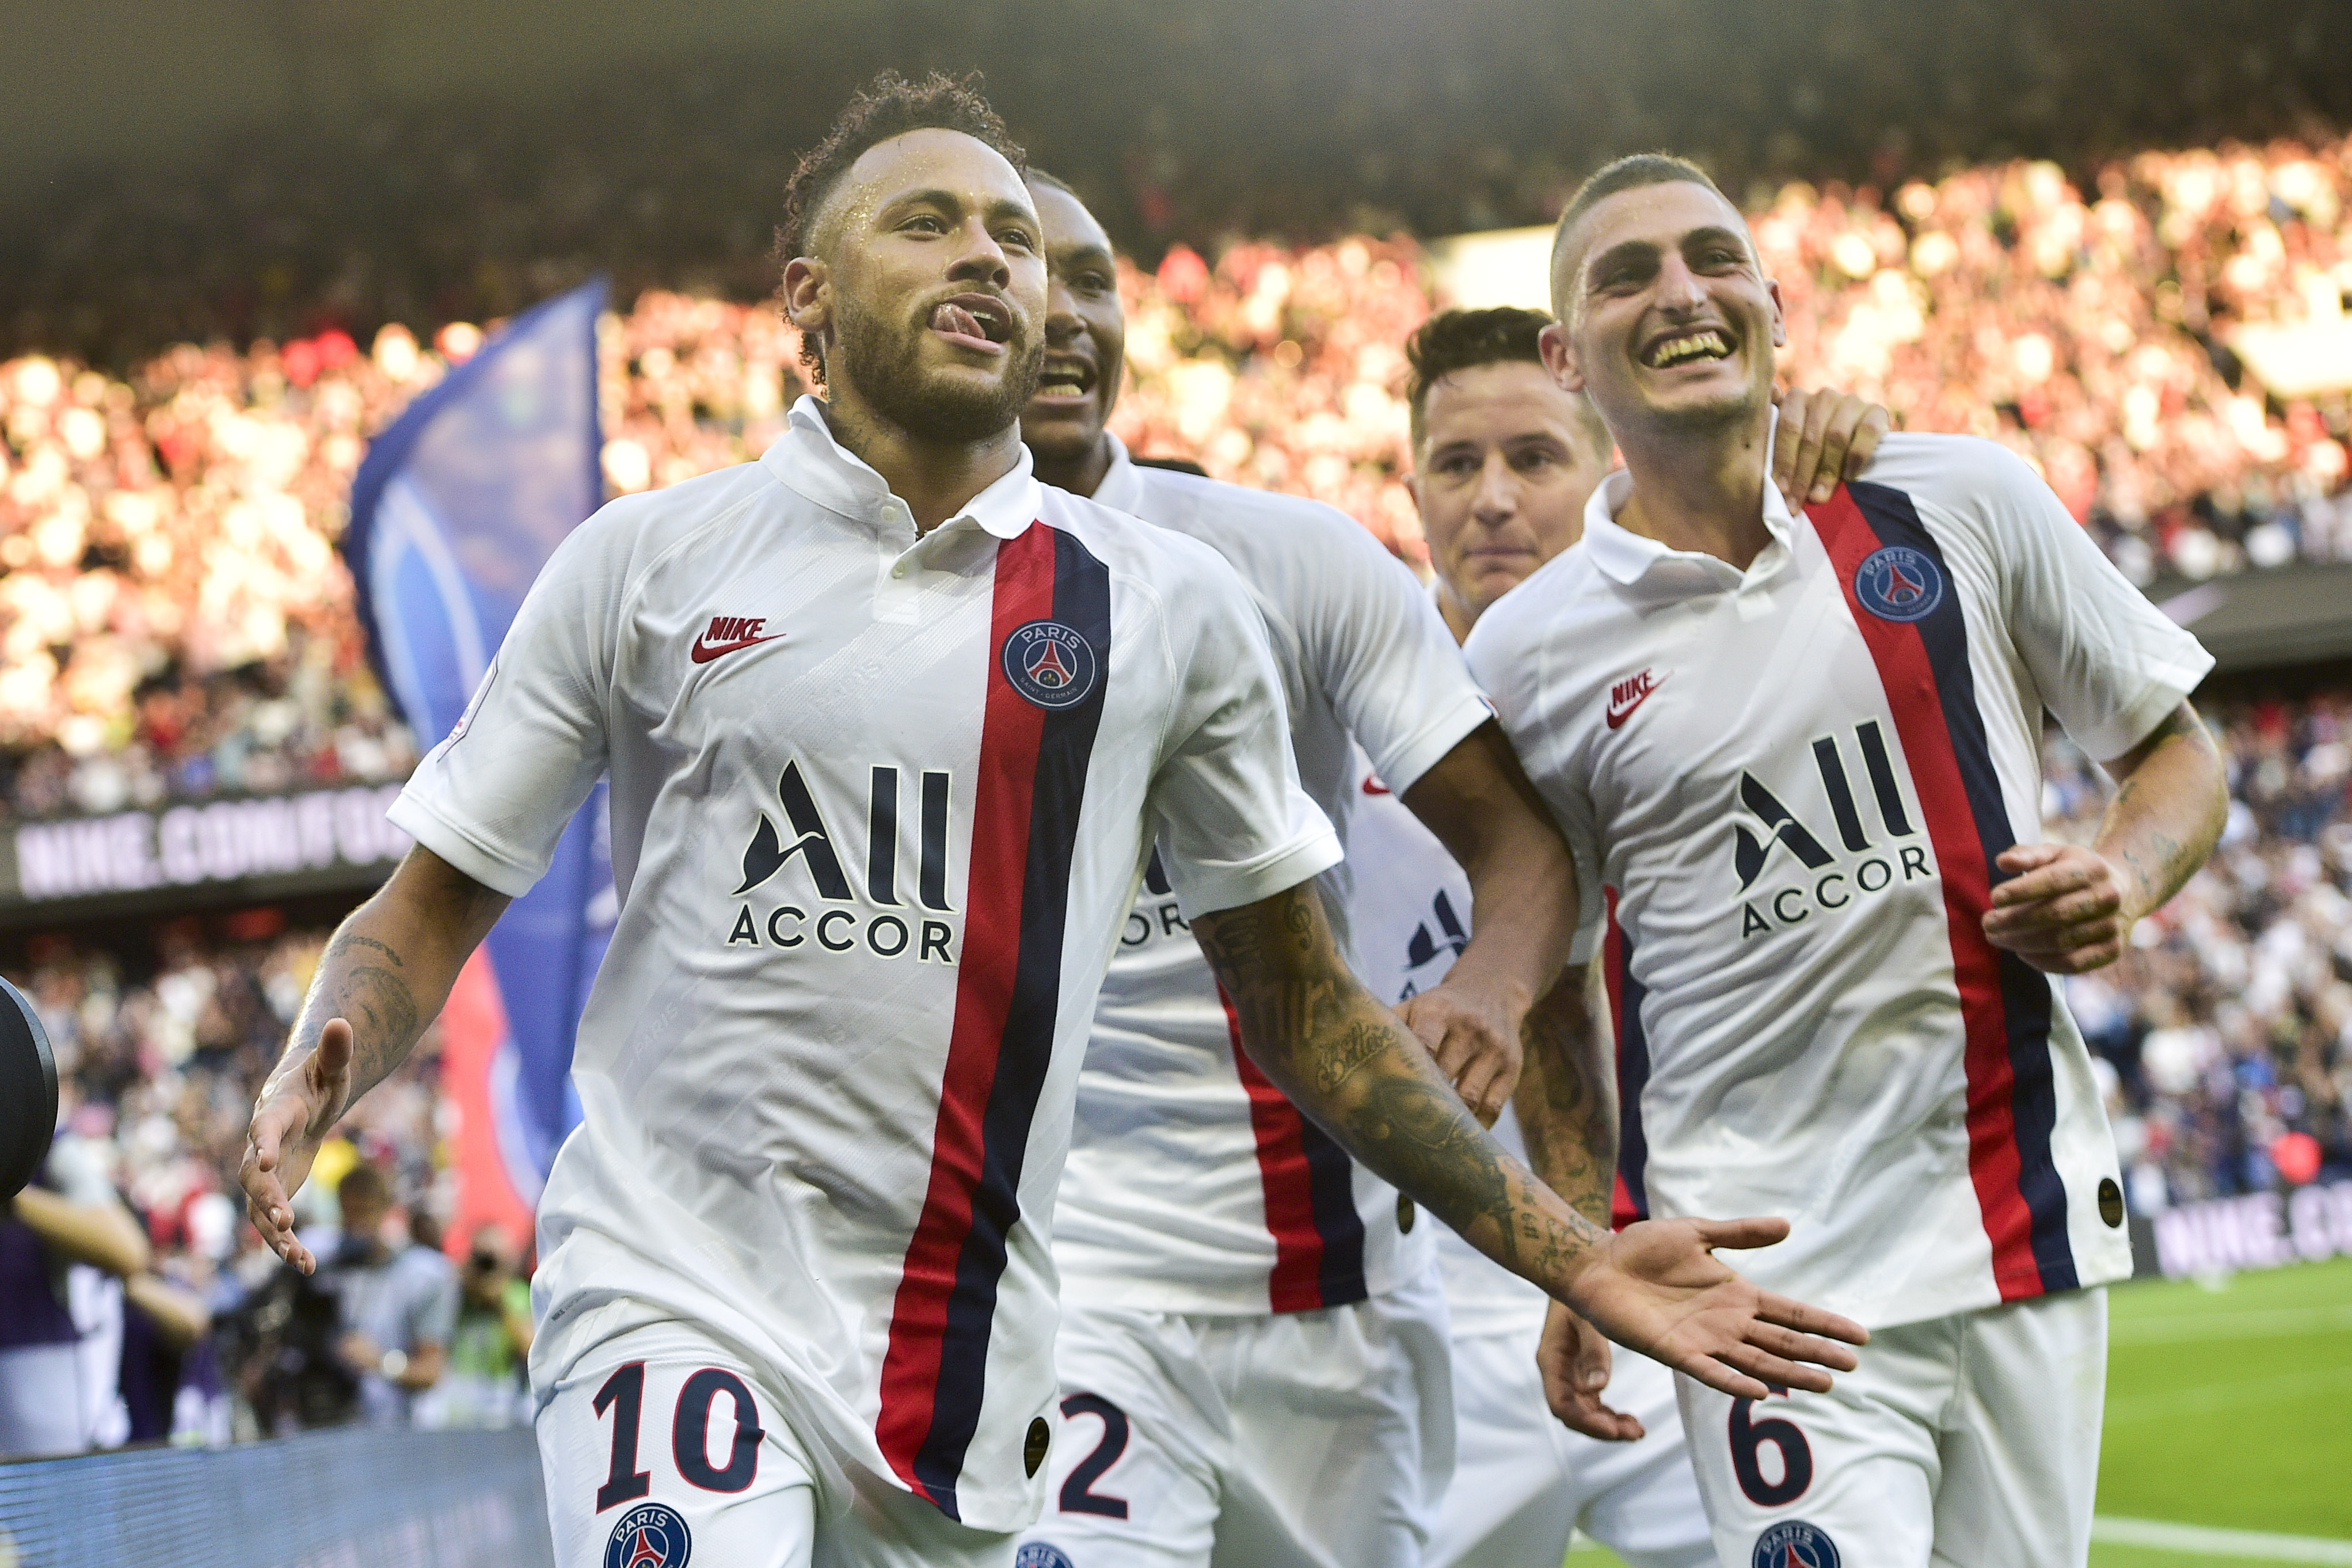 Football - Ligue 1 - Insulté, sifflé mais buteur providentiel, insubmersible Neymar